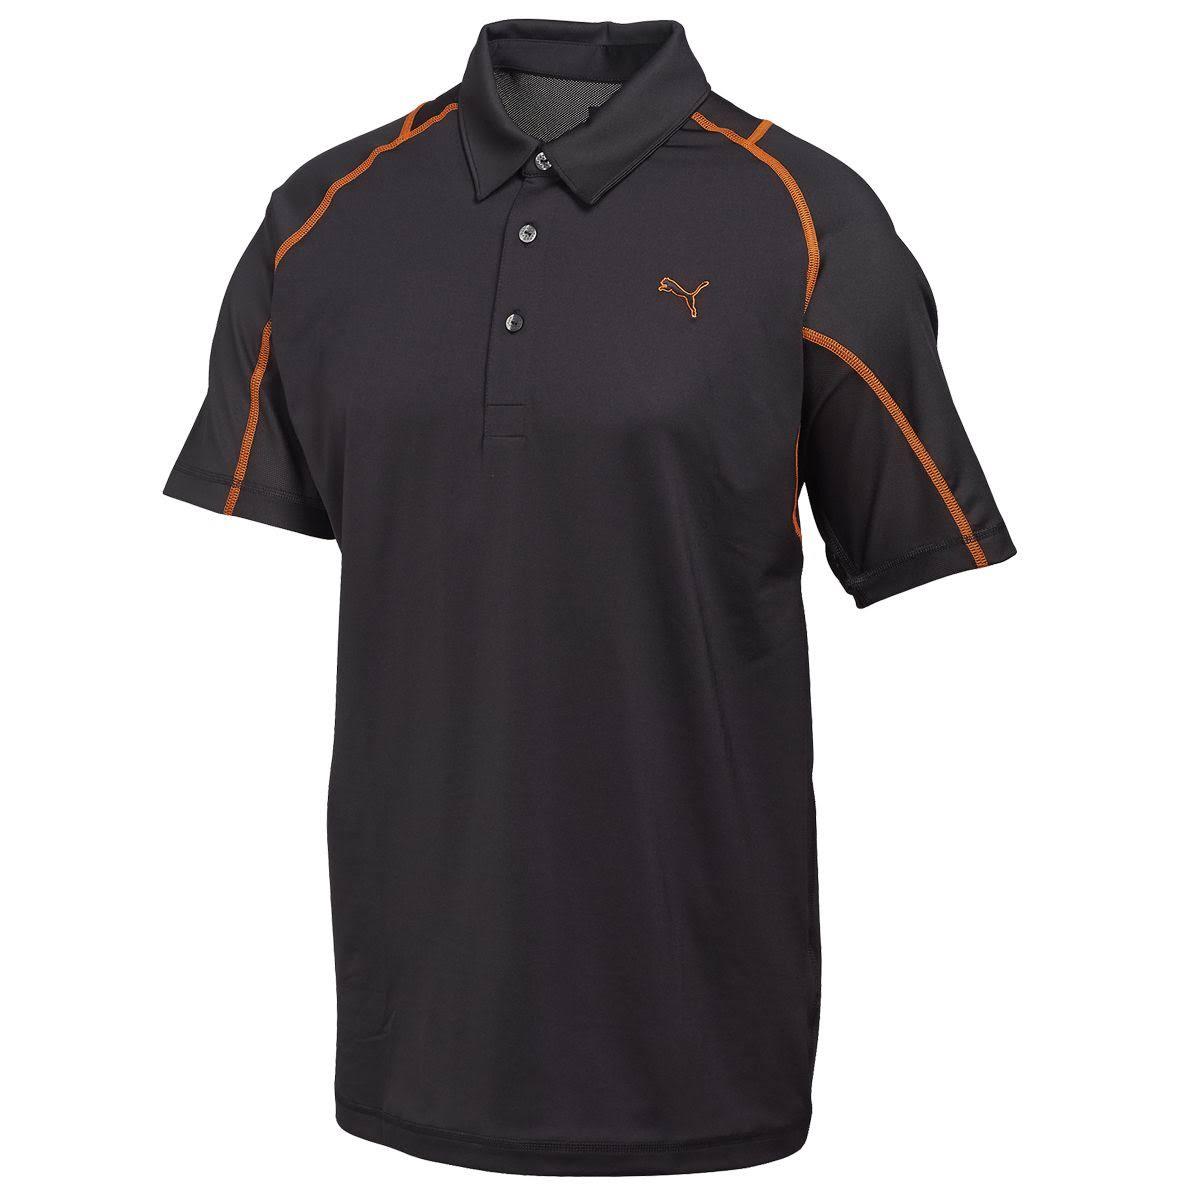 New 2015 Puma Golf Titan Tour Polo Shirt 568252 Pick